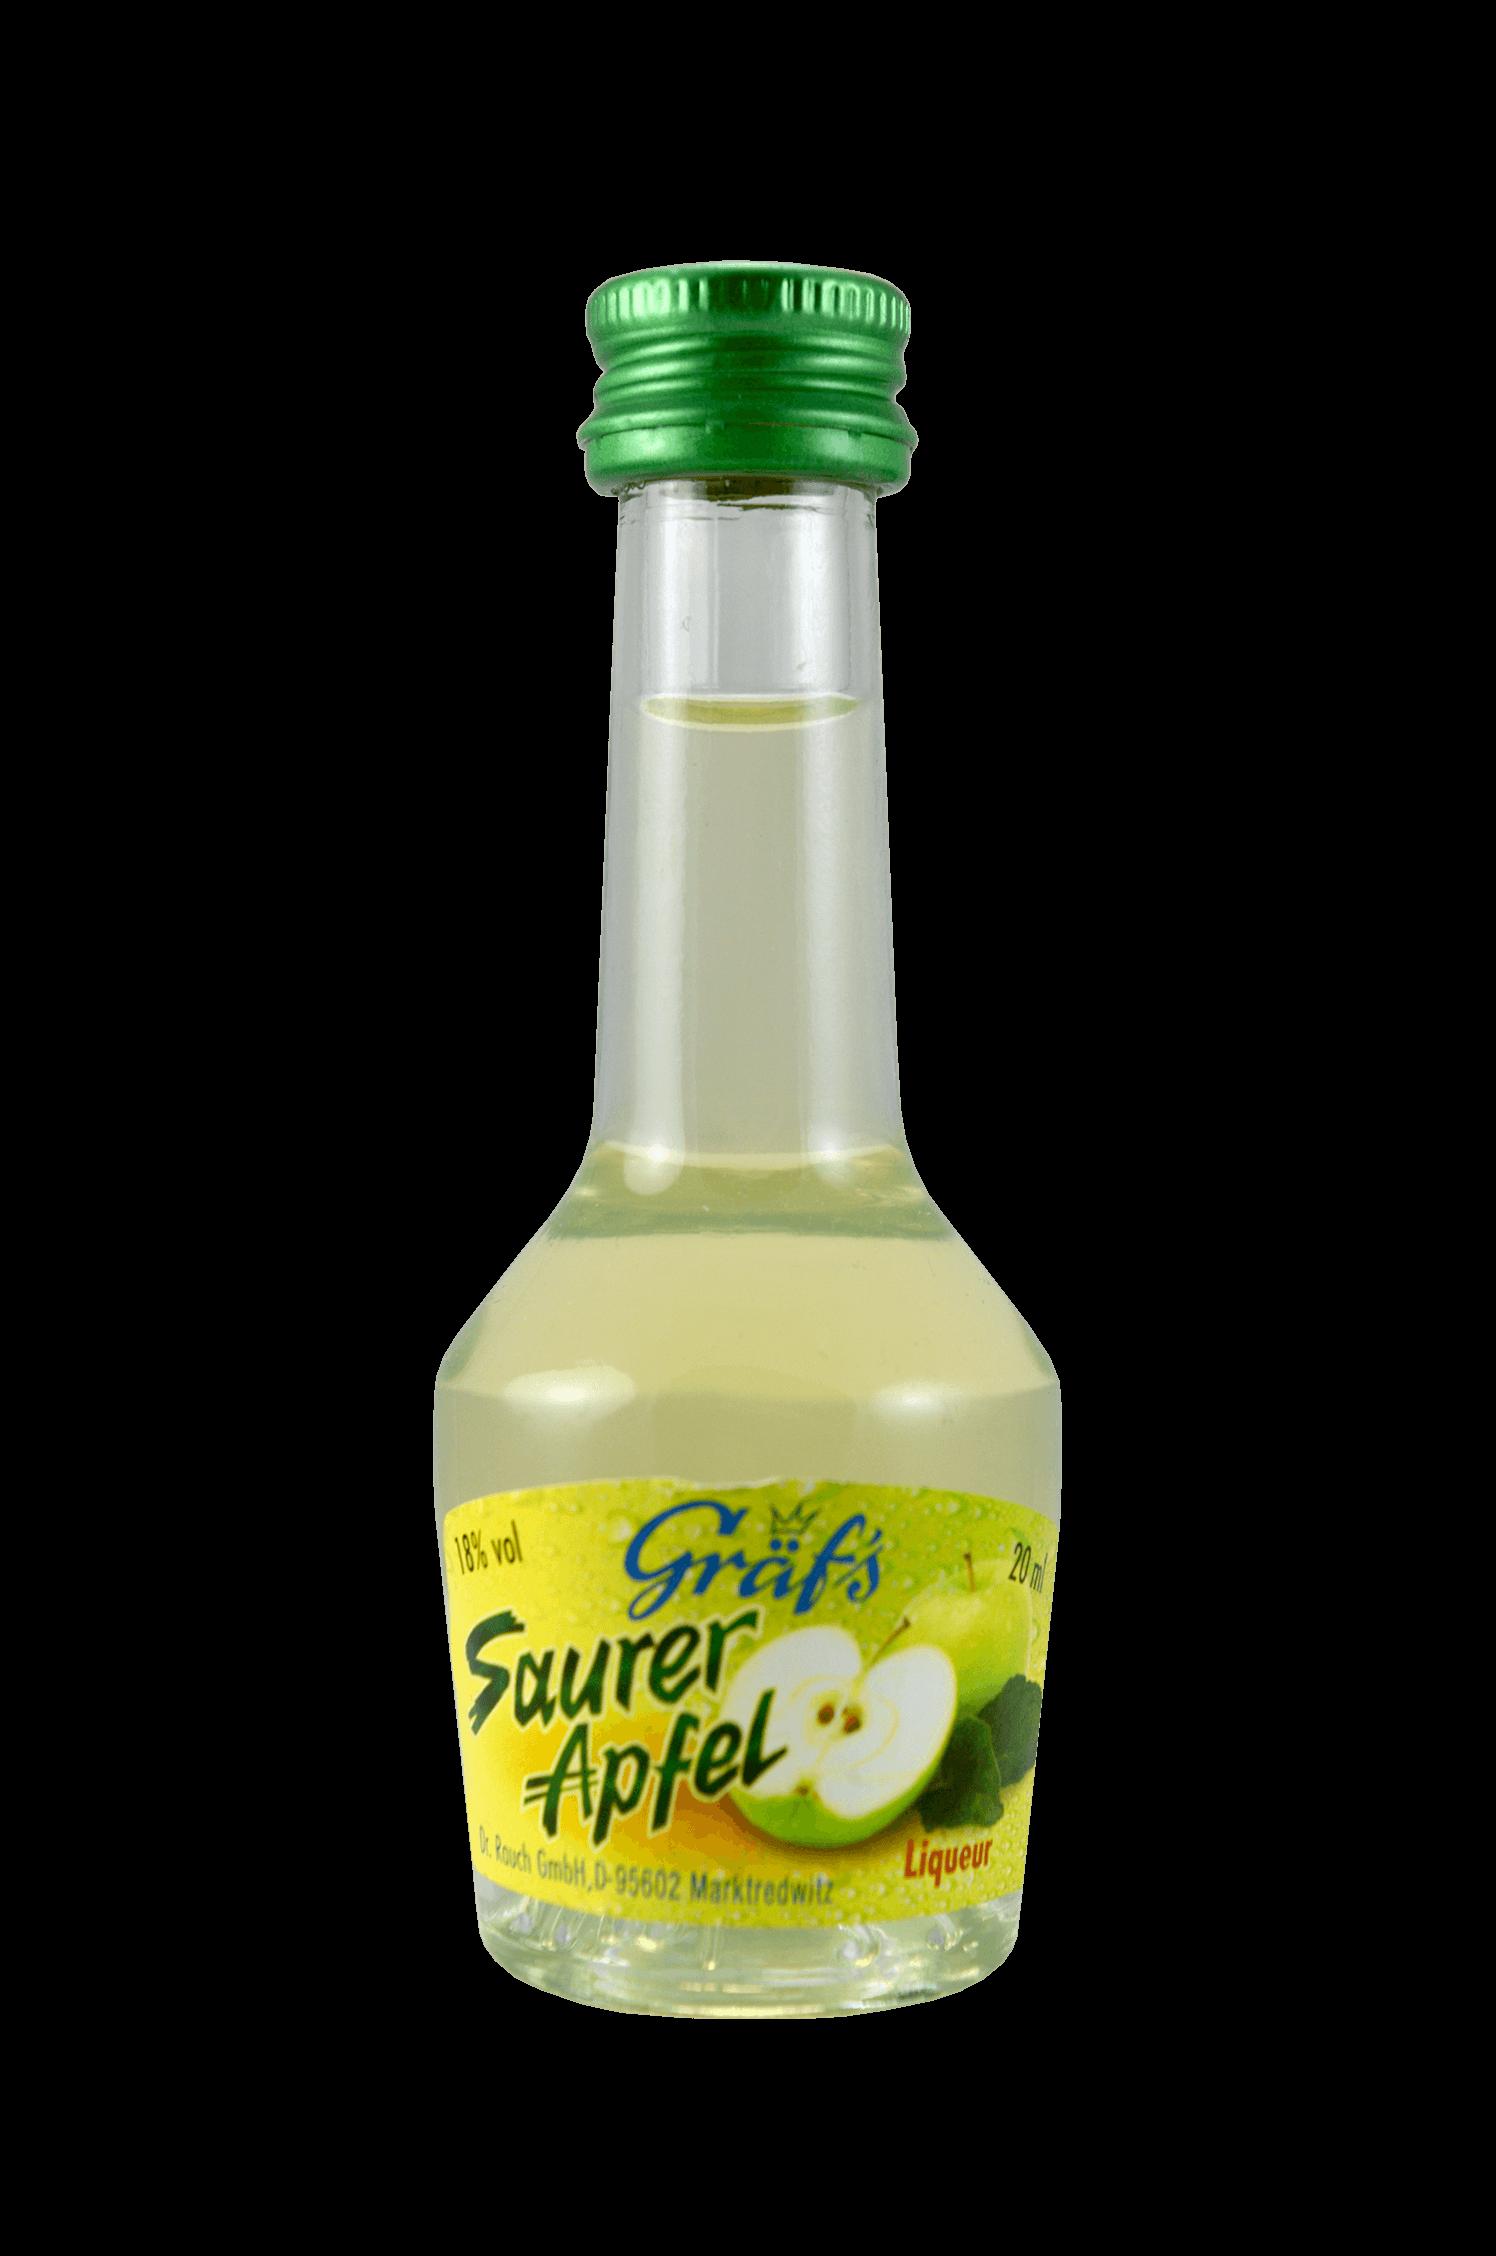 Saurer Apfel Liqueur